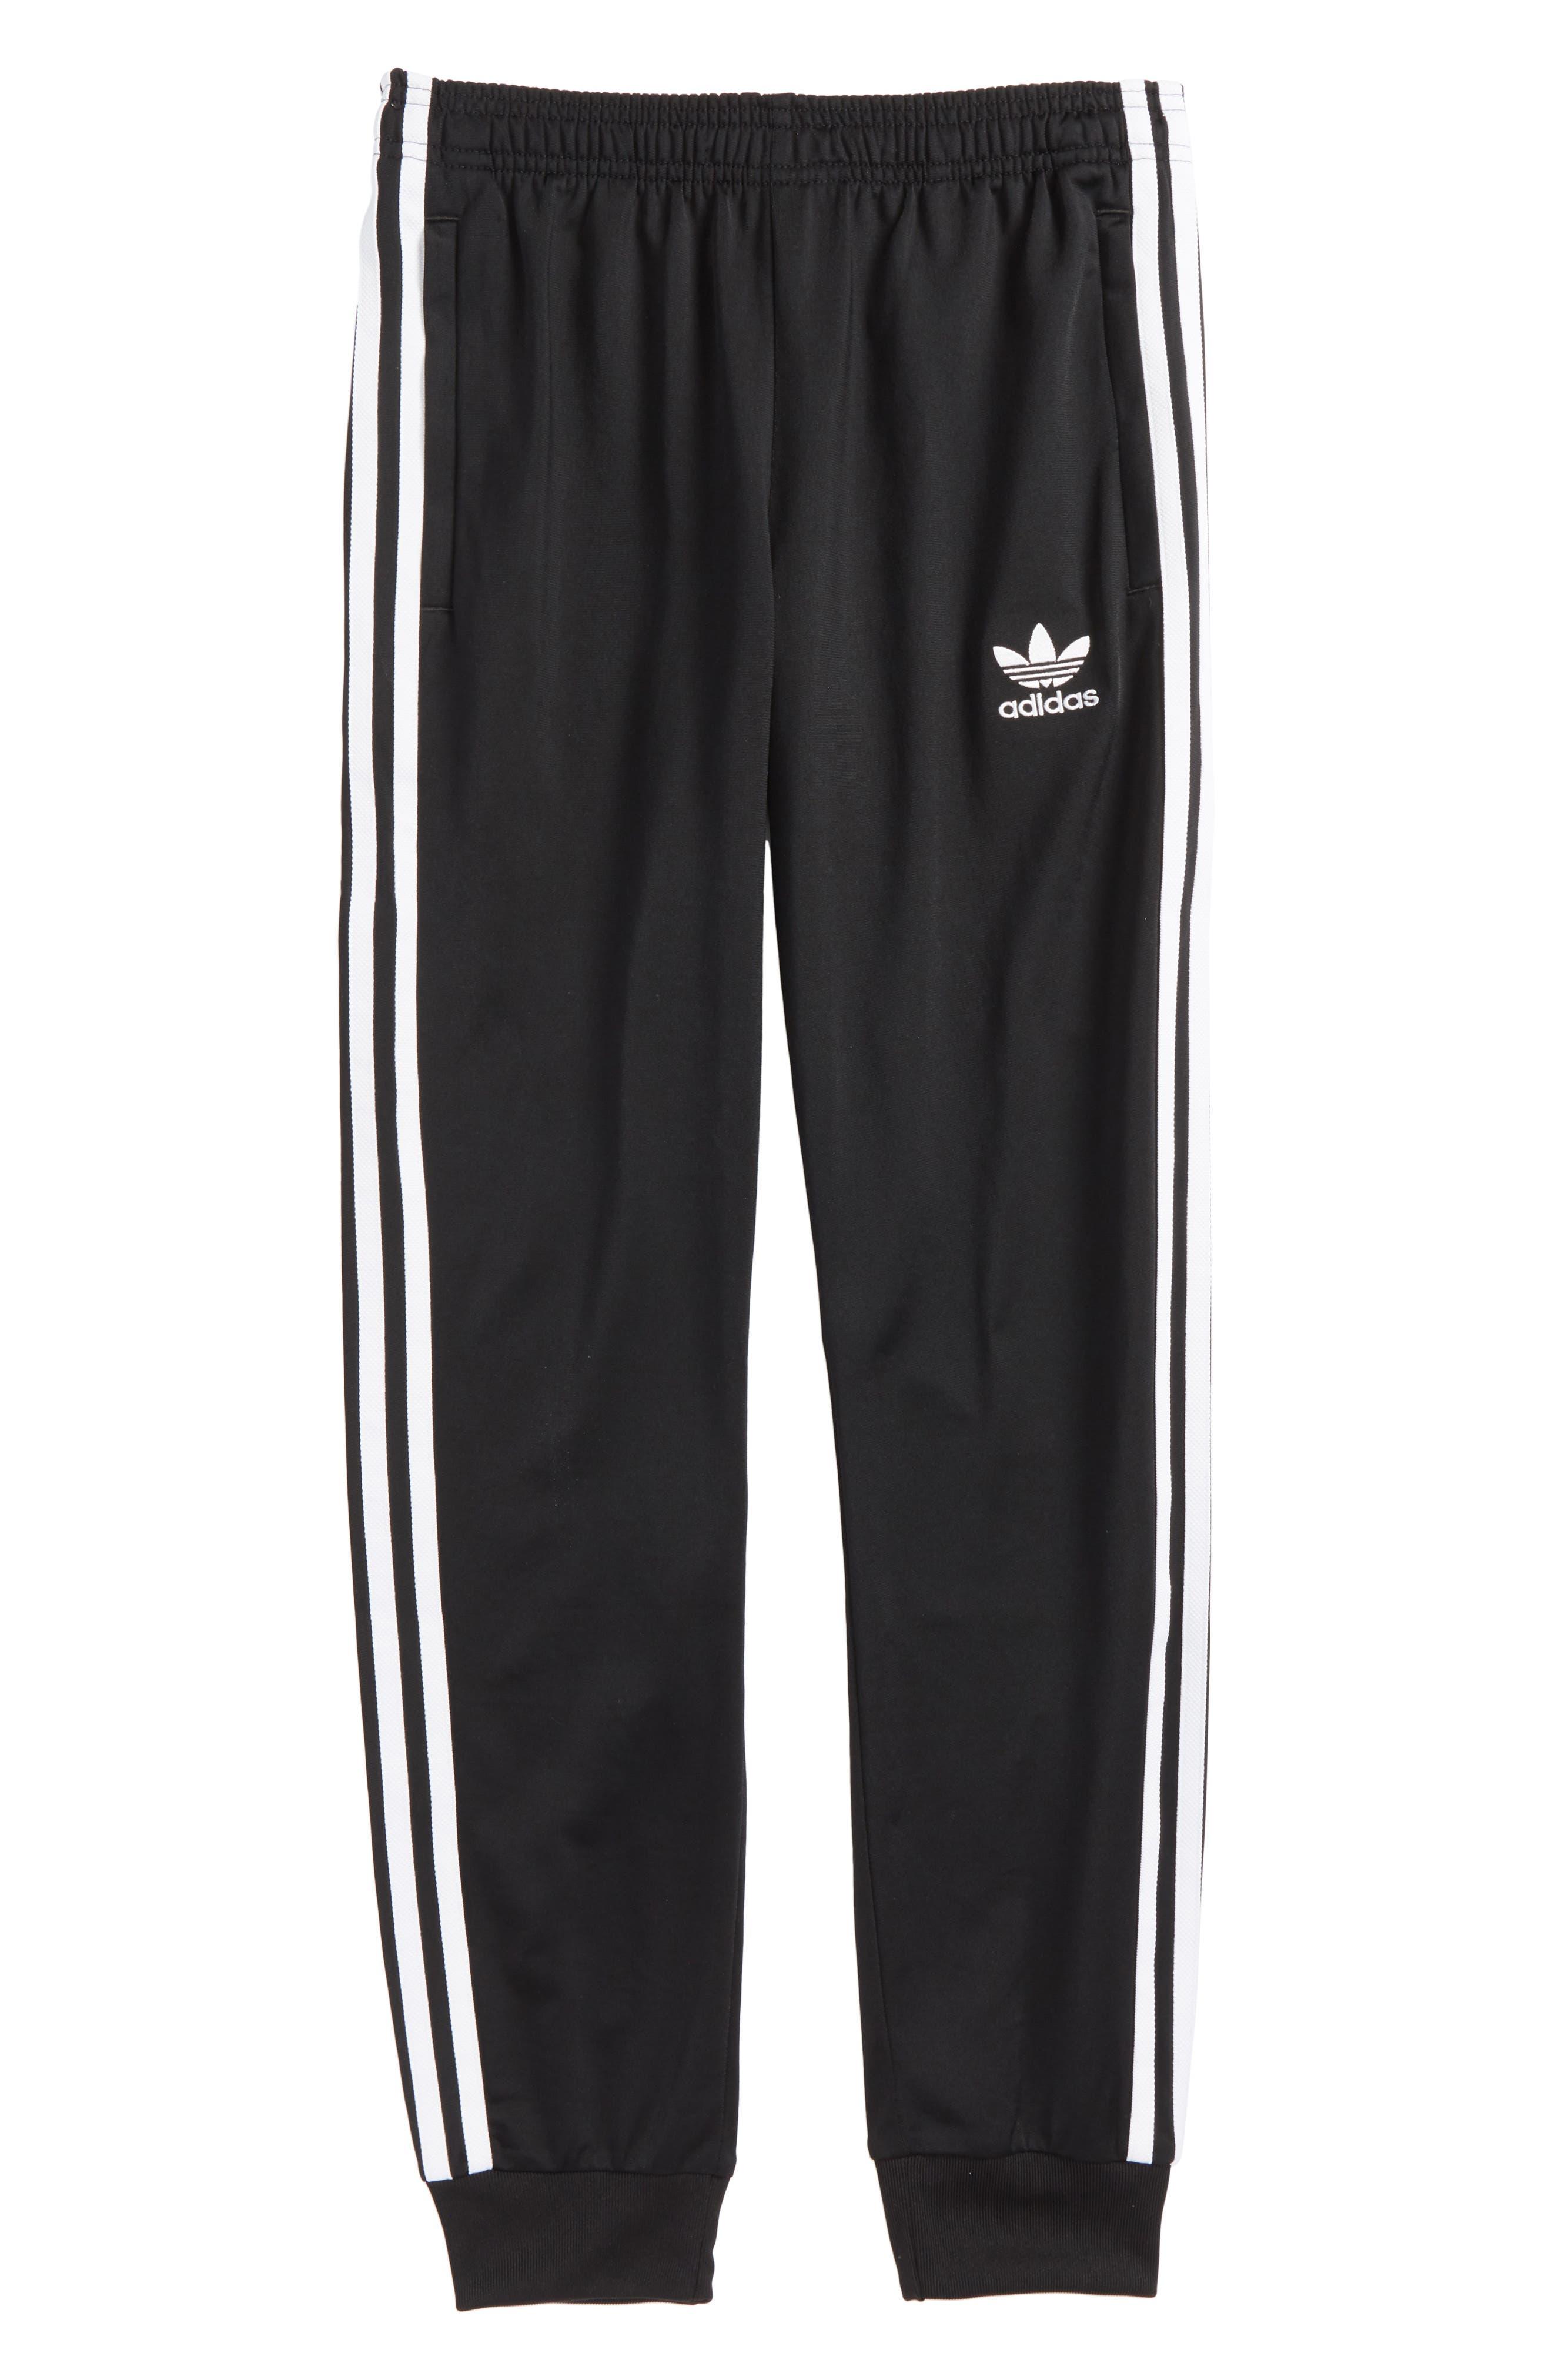 SST Track Pants,                         Main,                         color, Black/ White